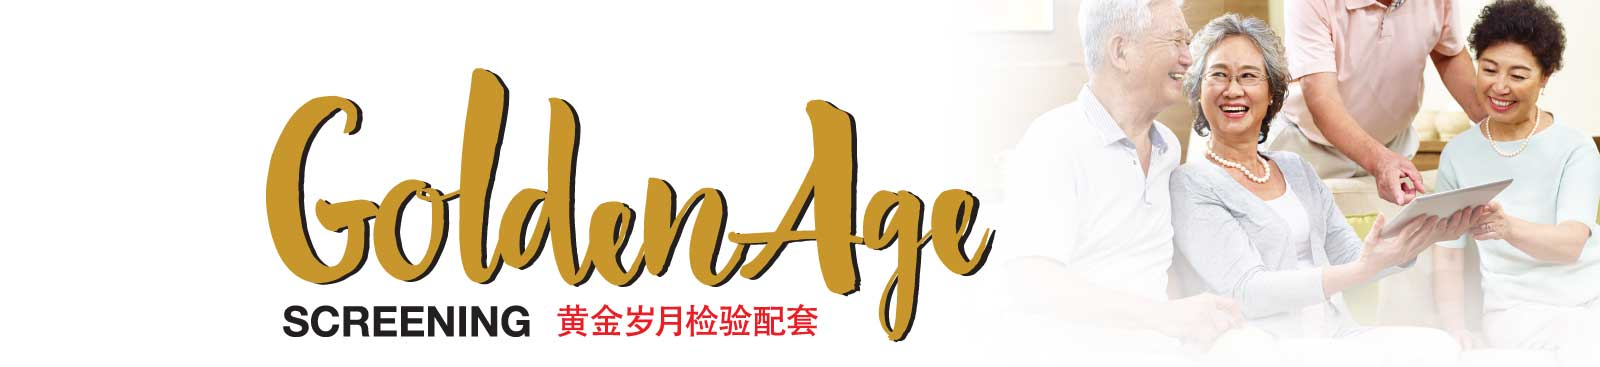 Golden Age Screening